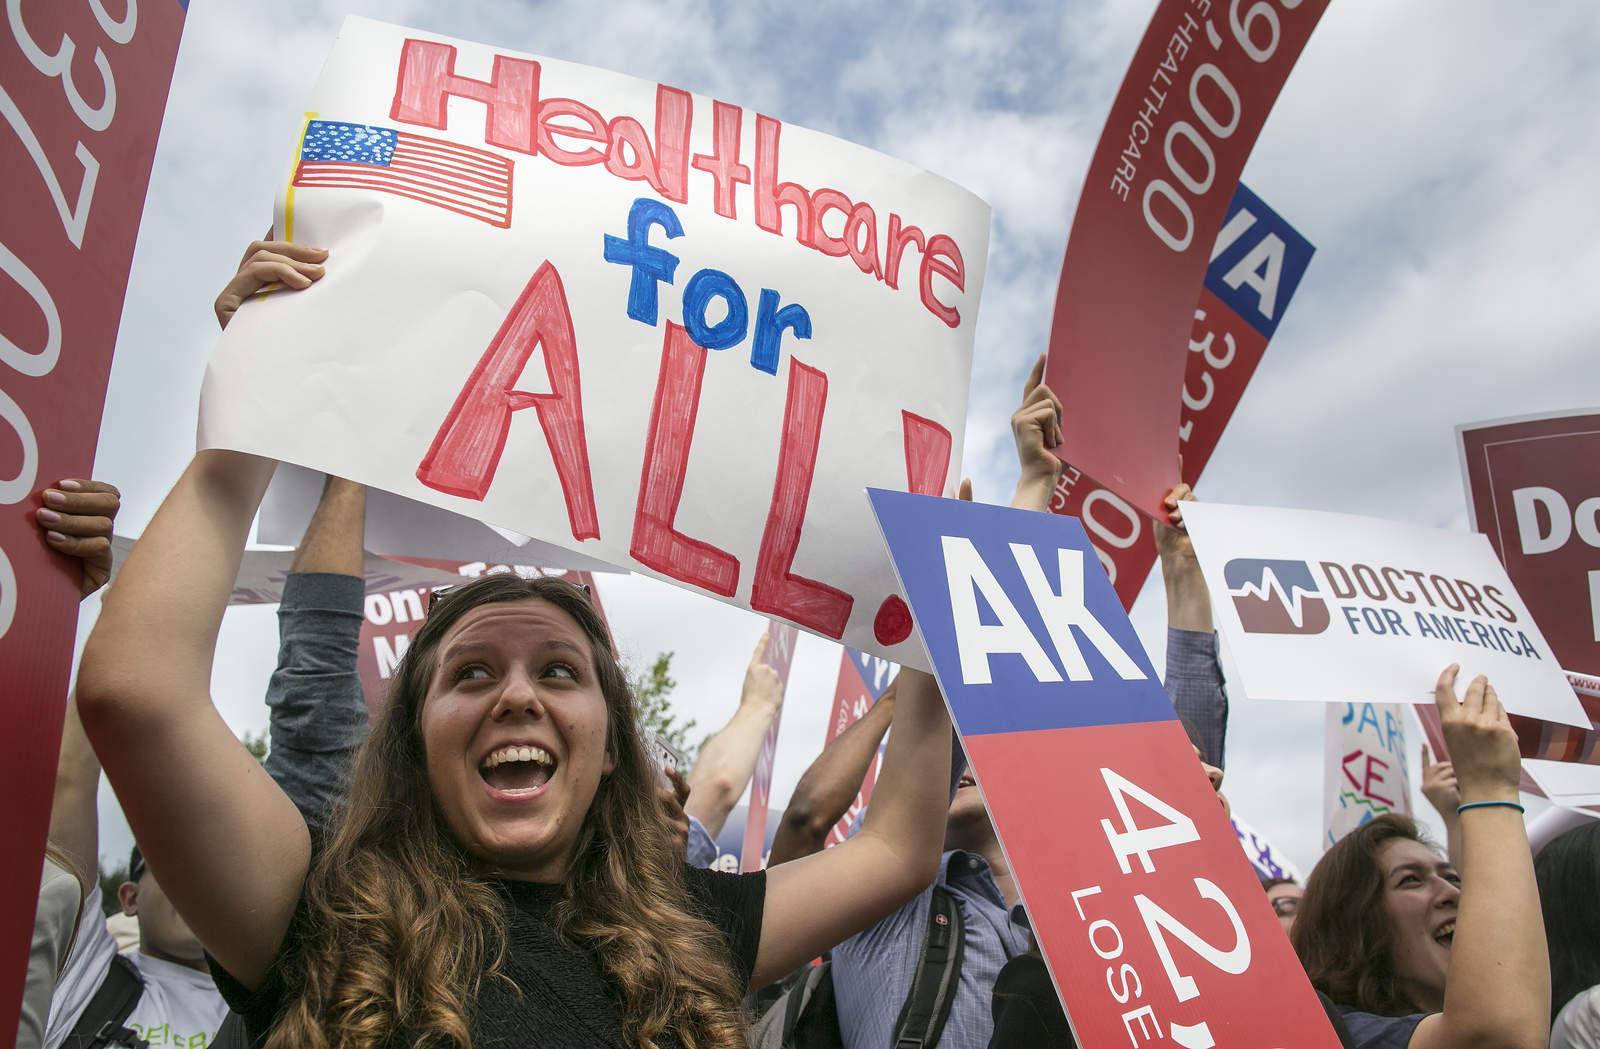 Juez declara inconstitucional la ley de salud 'Obamacare'